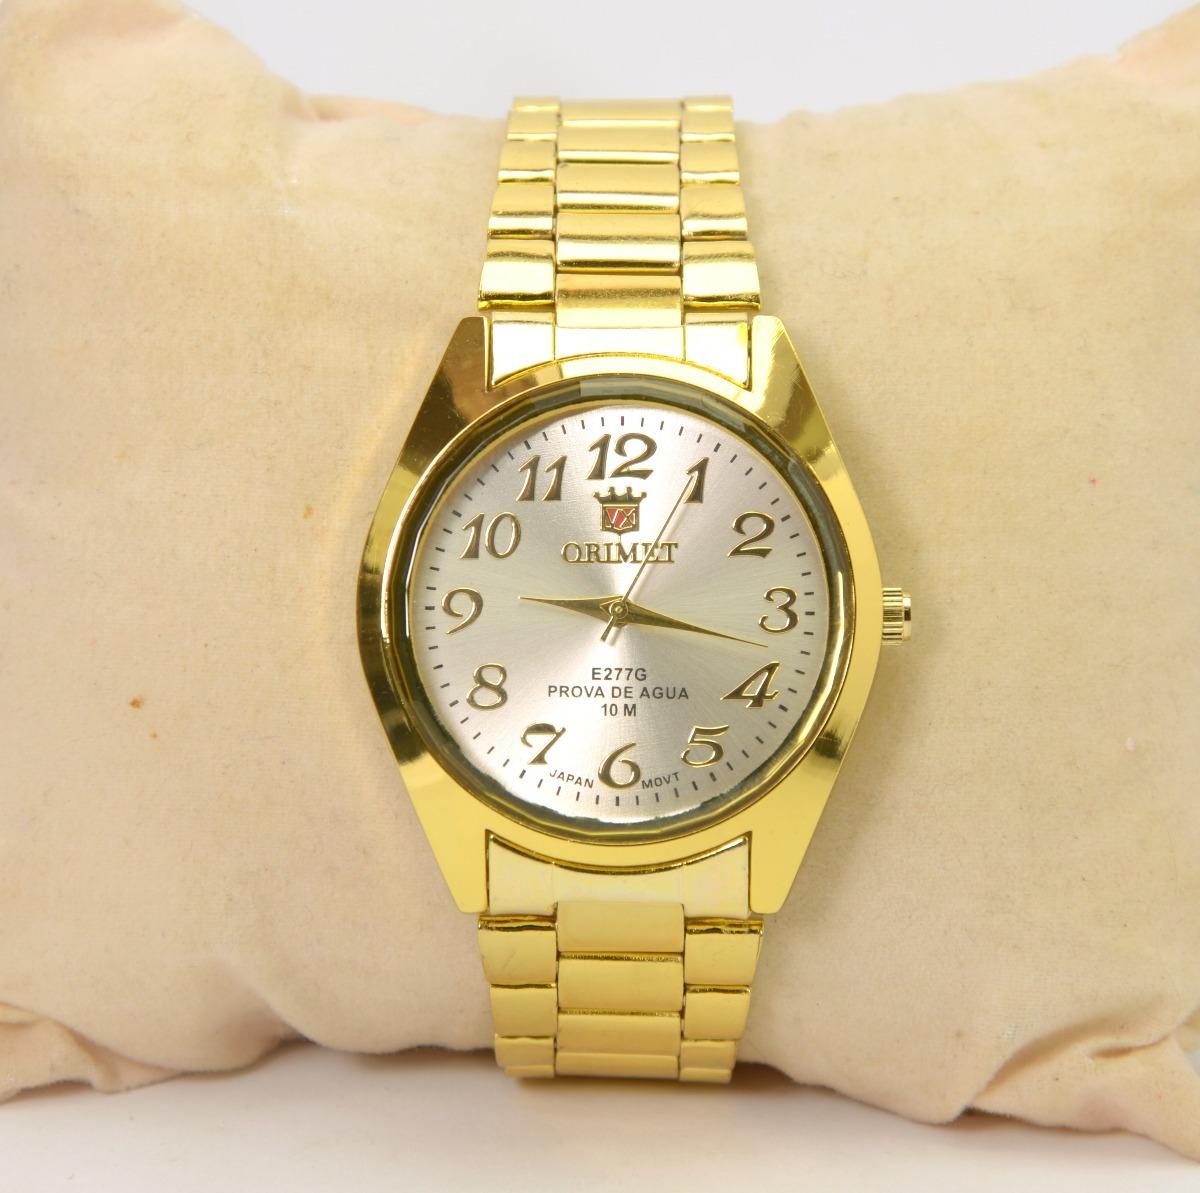 e7755256dee relógio feminino de pulso dourado orimet resistente barato. Carregando zoom.